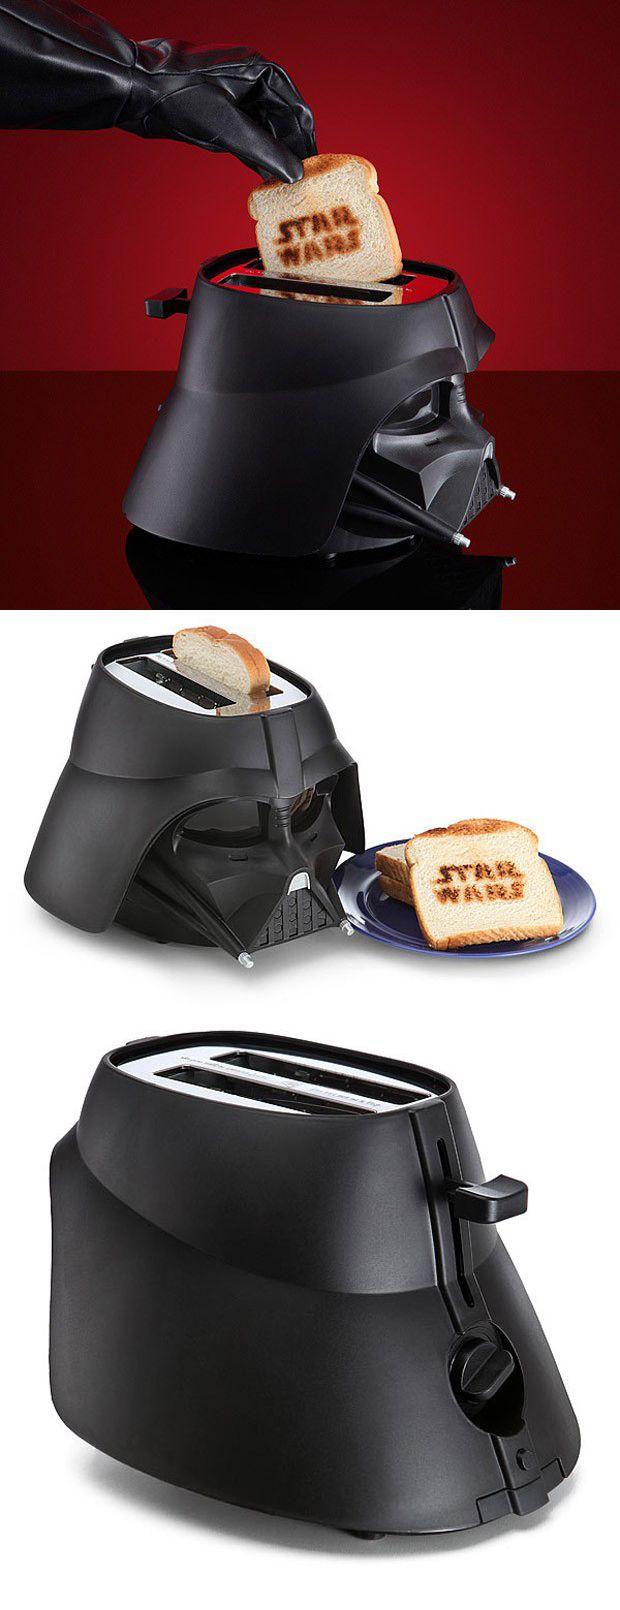 This.is.fantastic.  http://technabob.com/blog/2015/01/22/darth-vader-toaster/#sthash.K9CYgnFl.dpuf